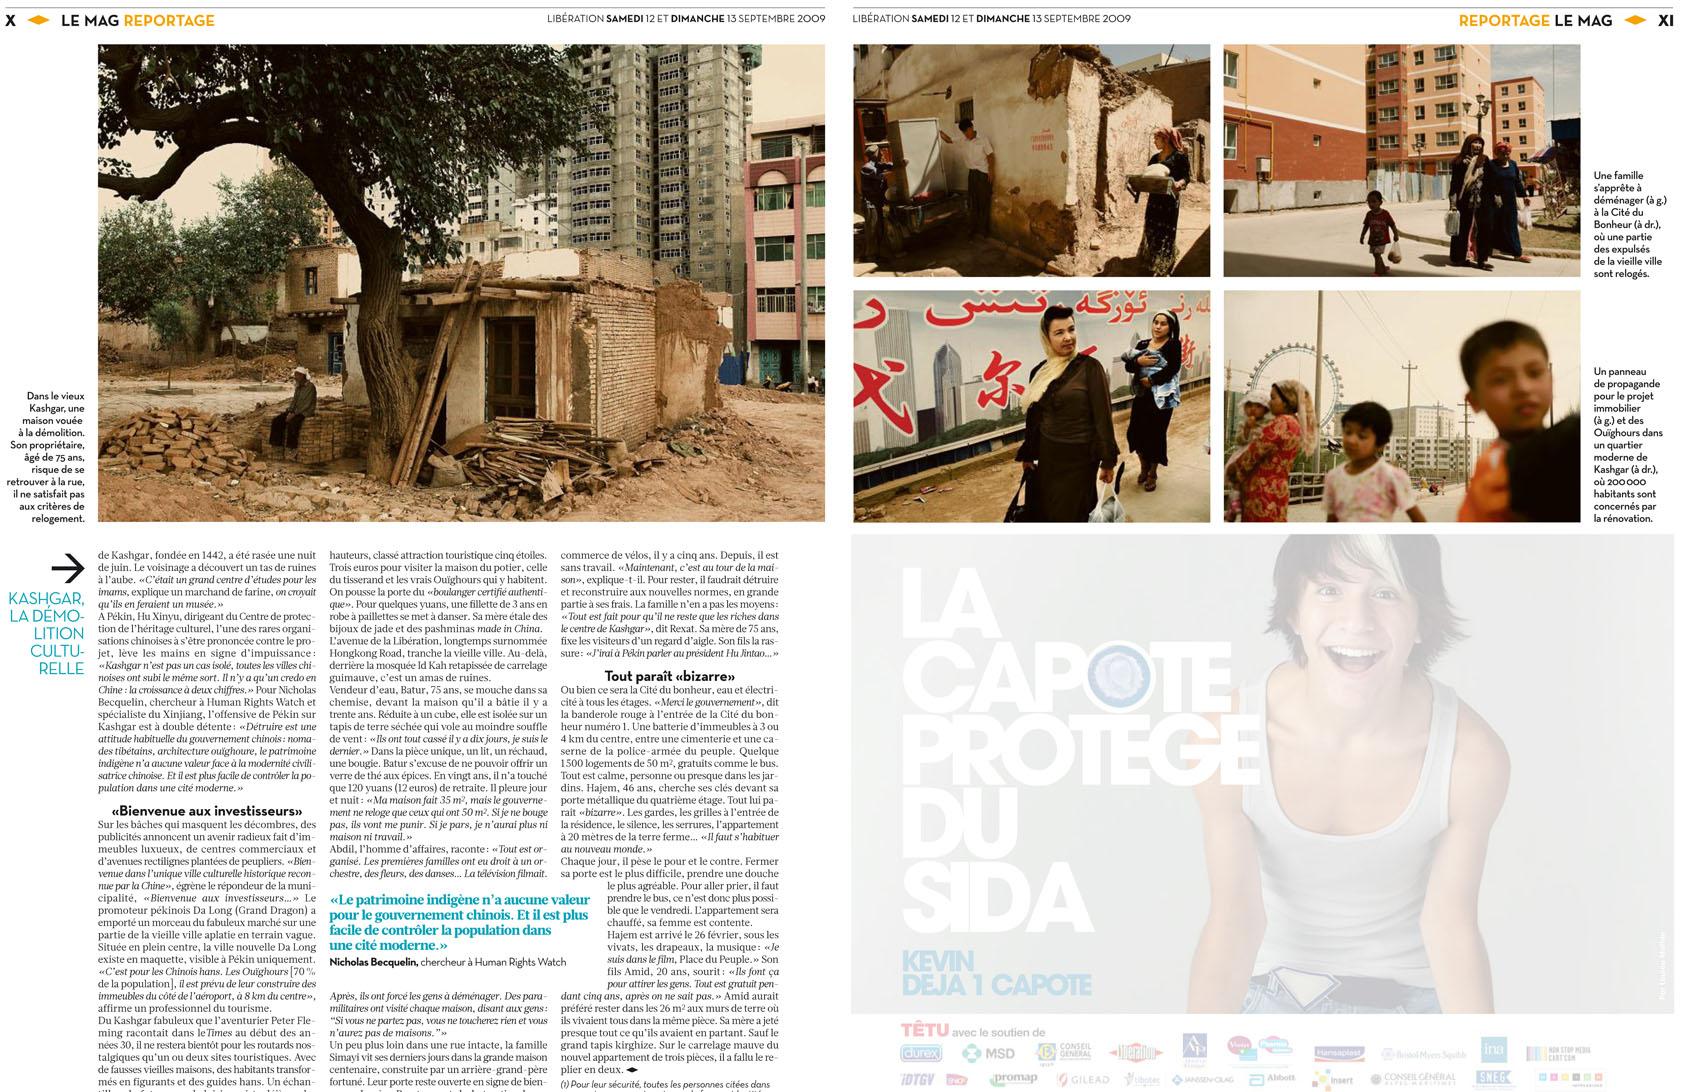 Liberation_20090912_Paris-1_SP1_011.jpg